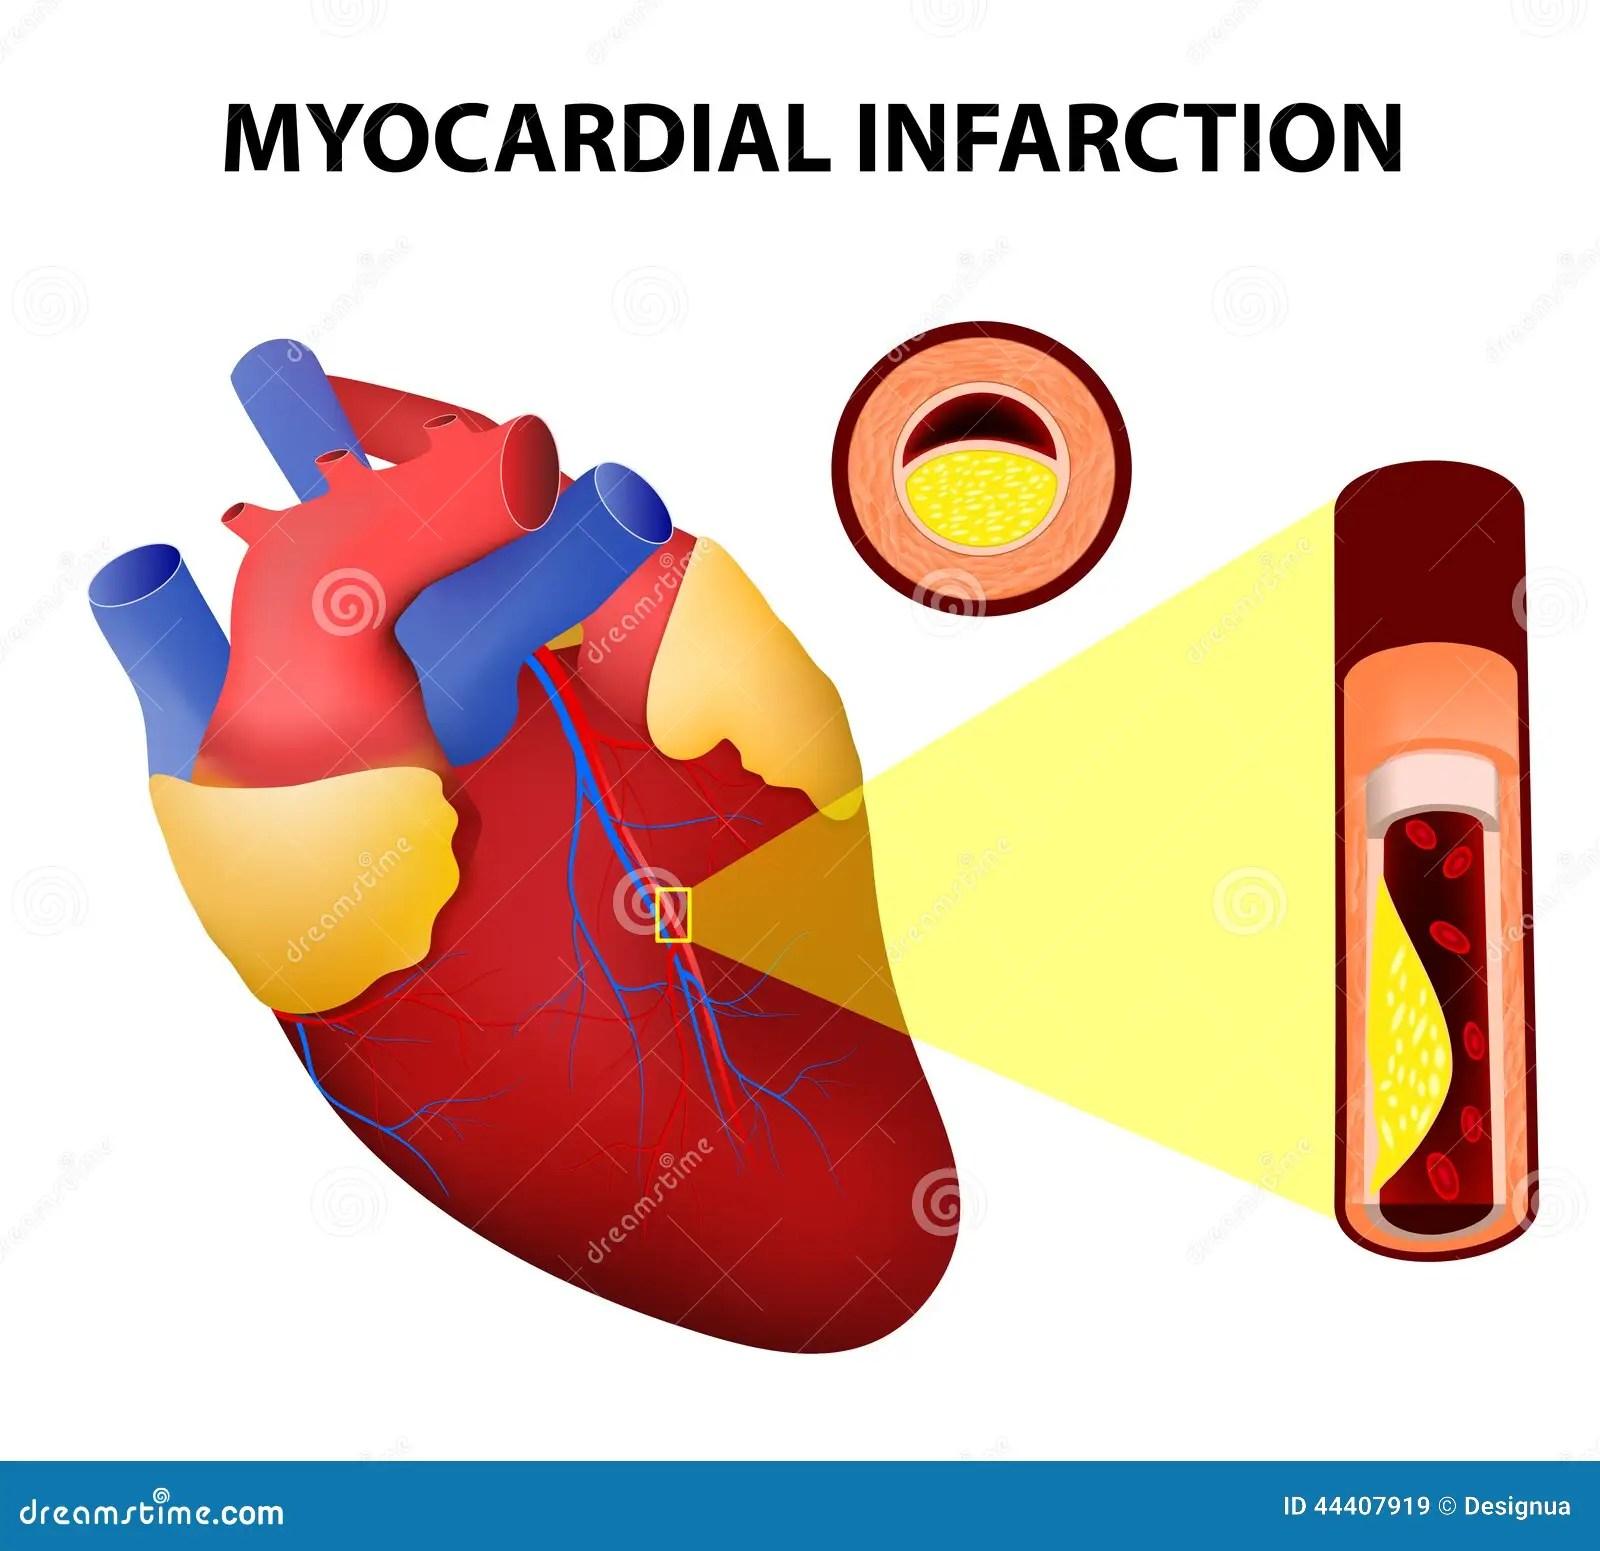 Myocardial Infarction Cartoon Vector